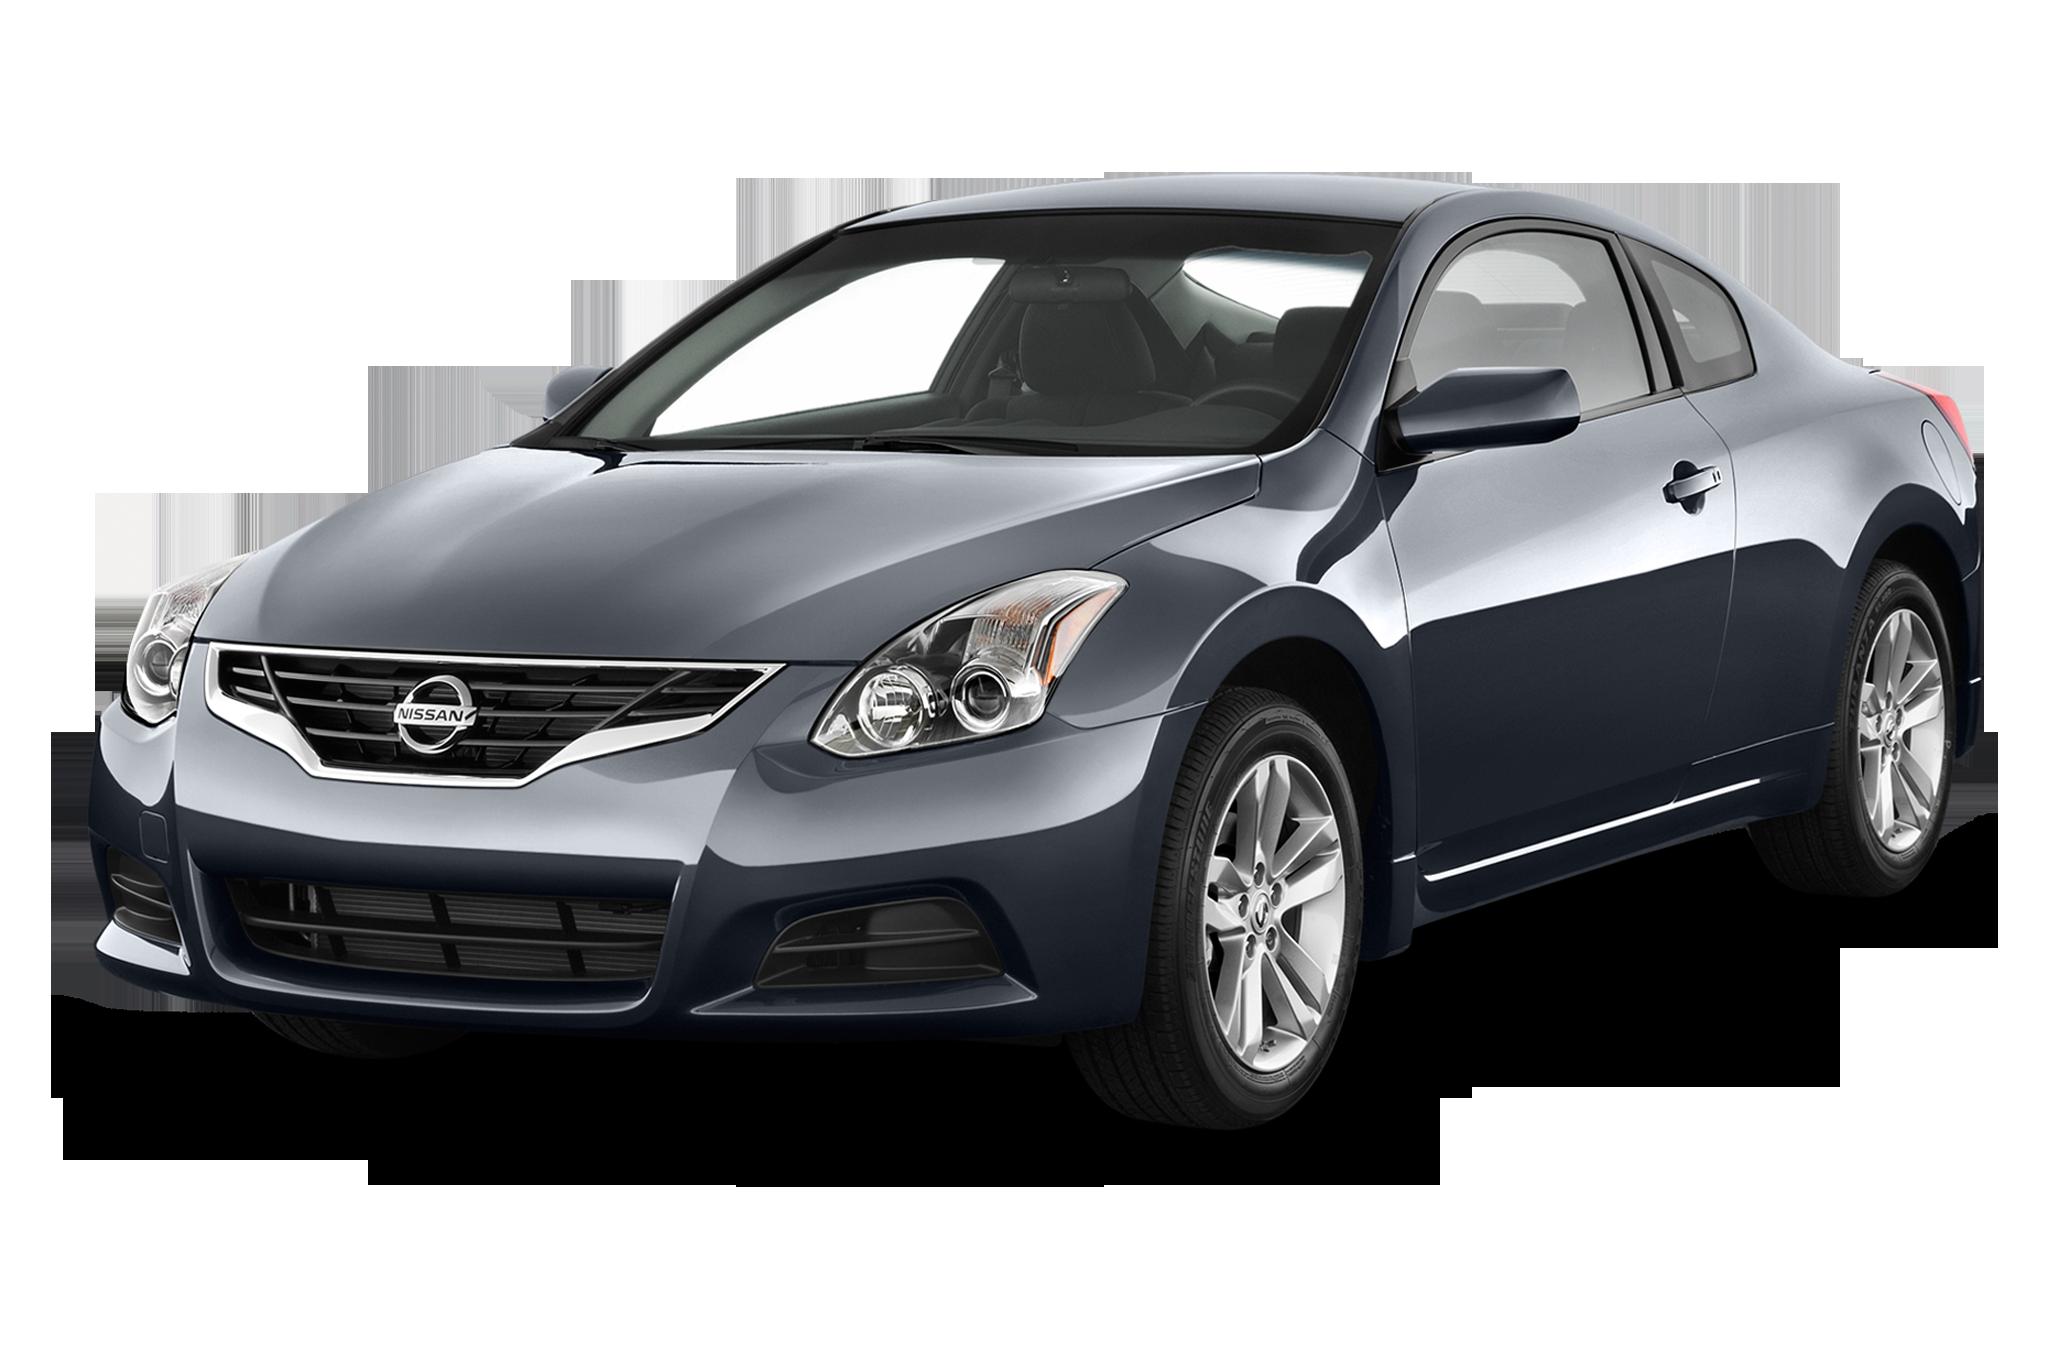 97 Nissan Altima >> 2011 Nissan Altima Coupe 2.5 S - Automobile Magazine